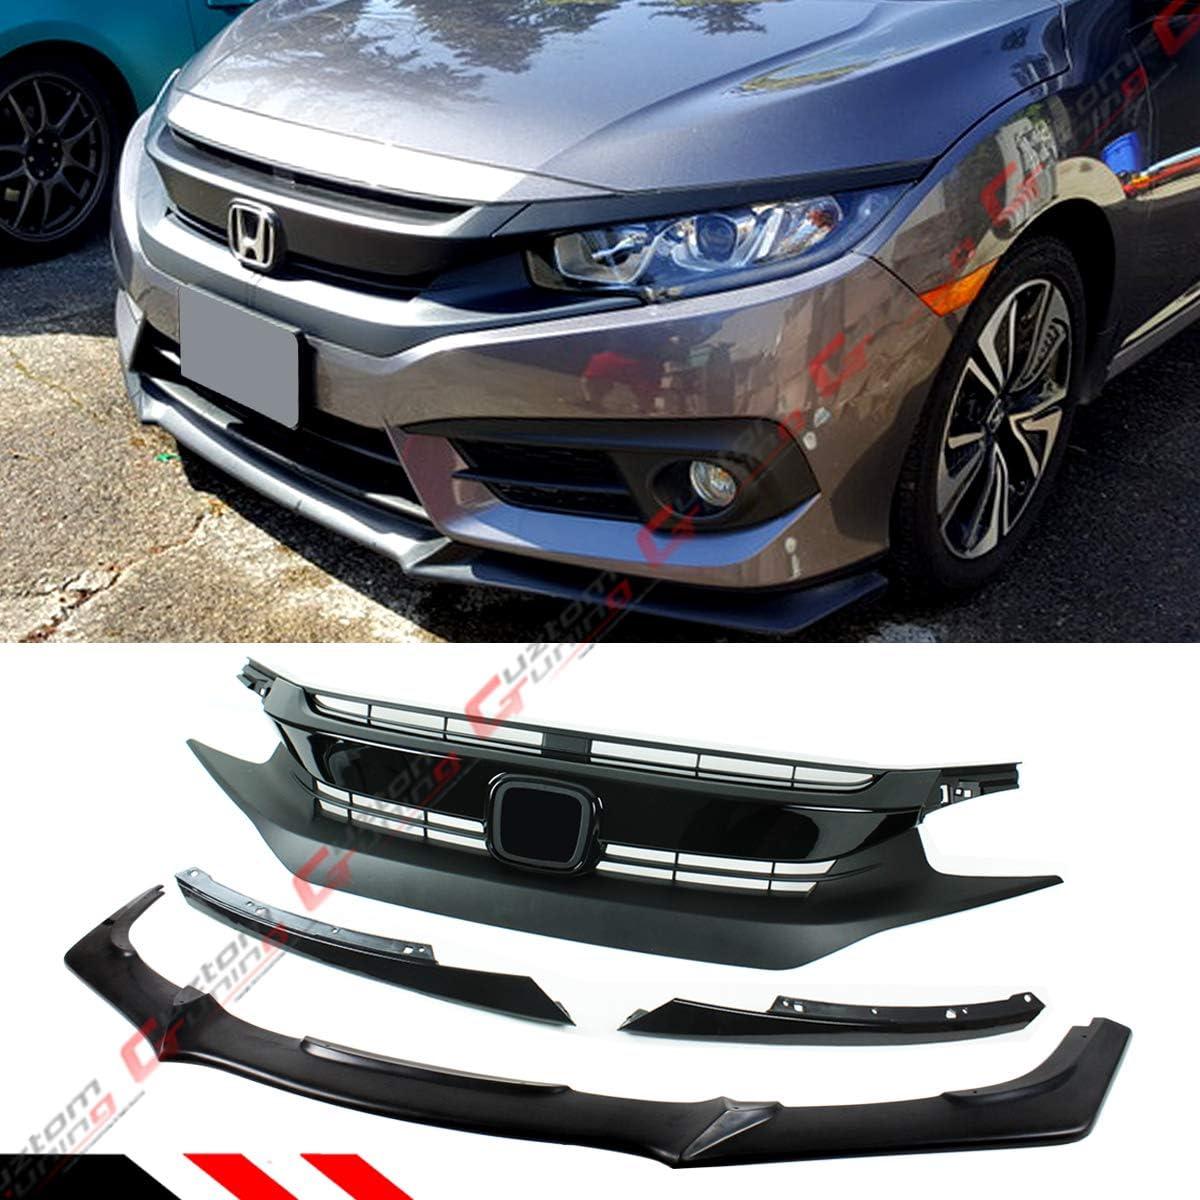 Fit 2016-2018 Honda Civic Gen 10Th Black Front Bumper Body Kit Spoiler Lip 3PCS